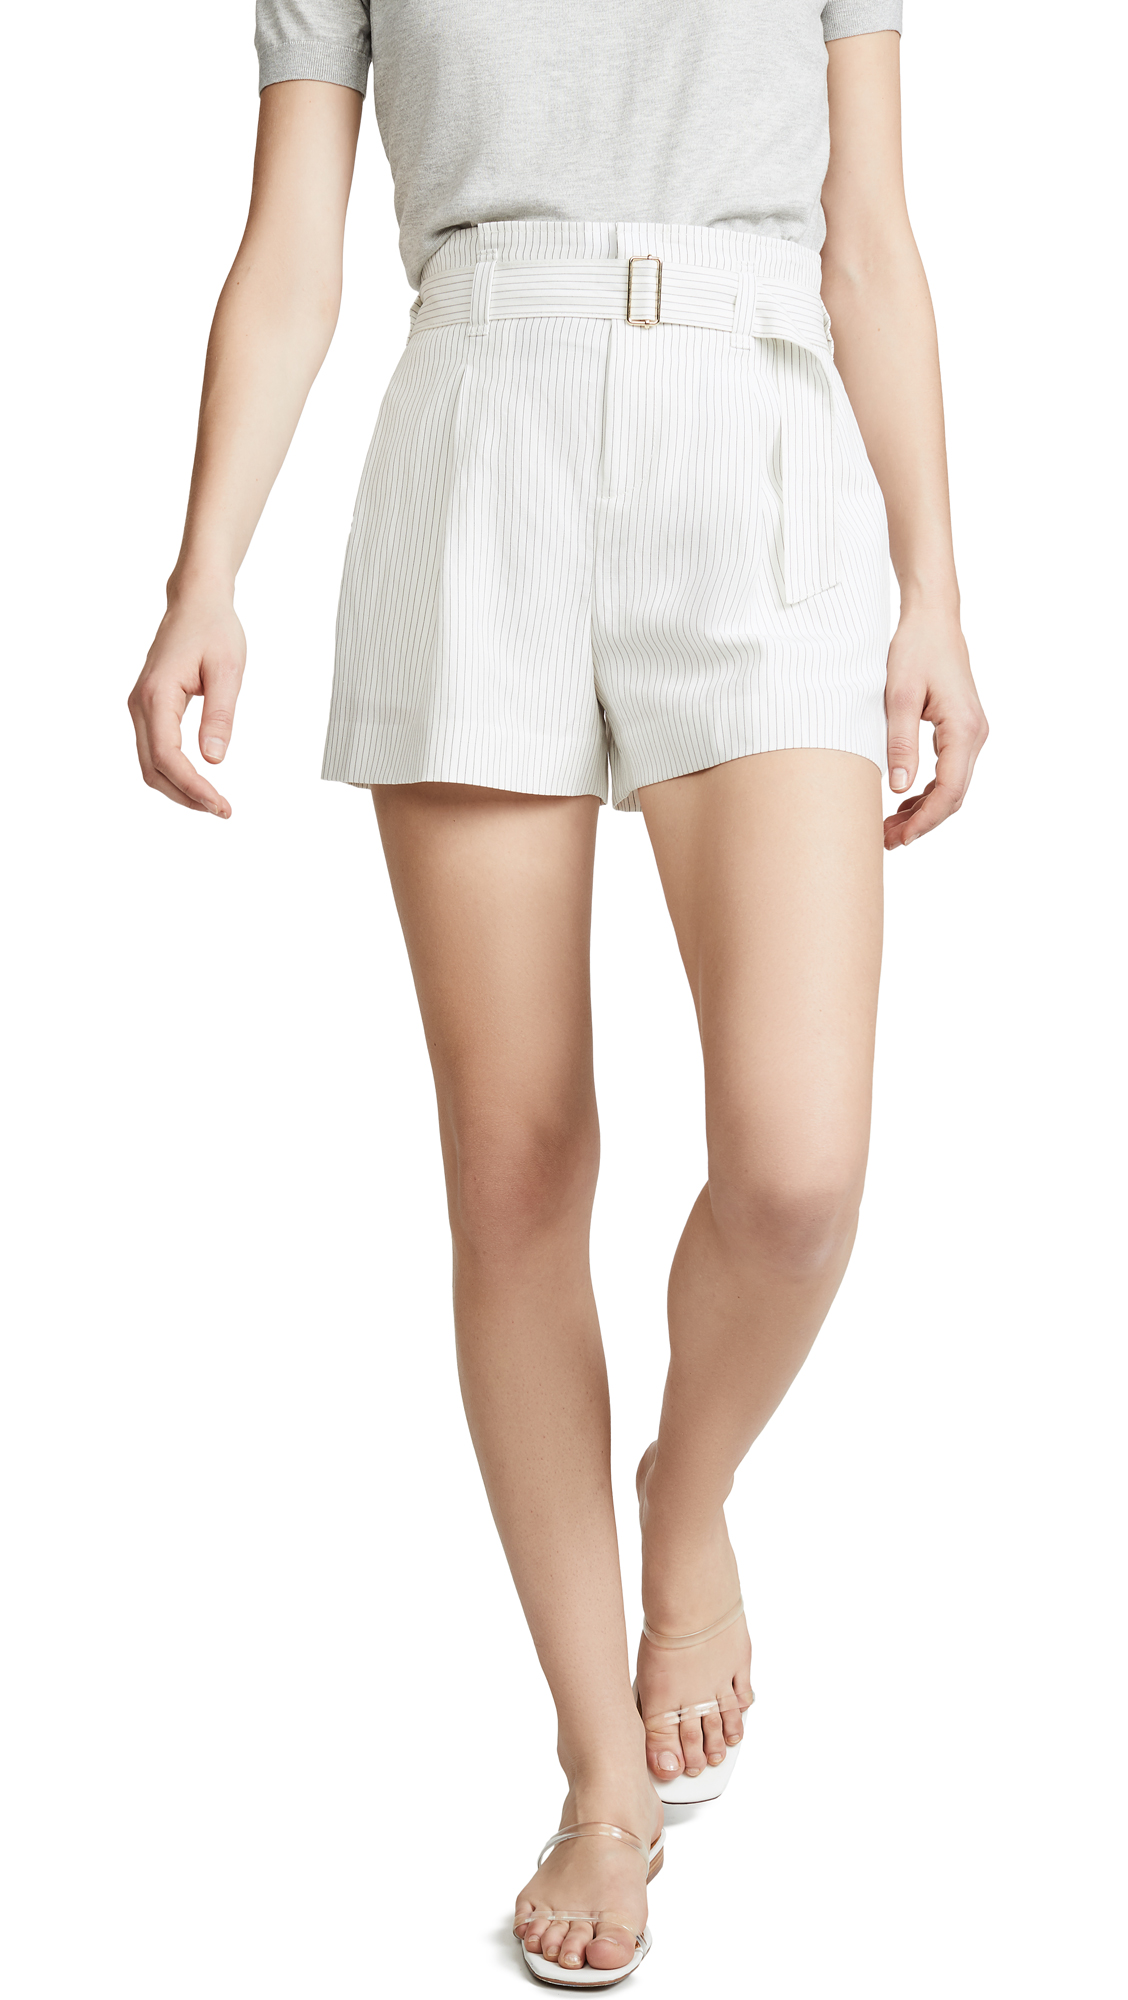 Club Monaco Darcee Stripe Shorts - Black/White